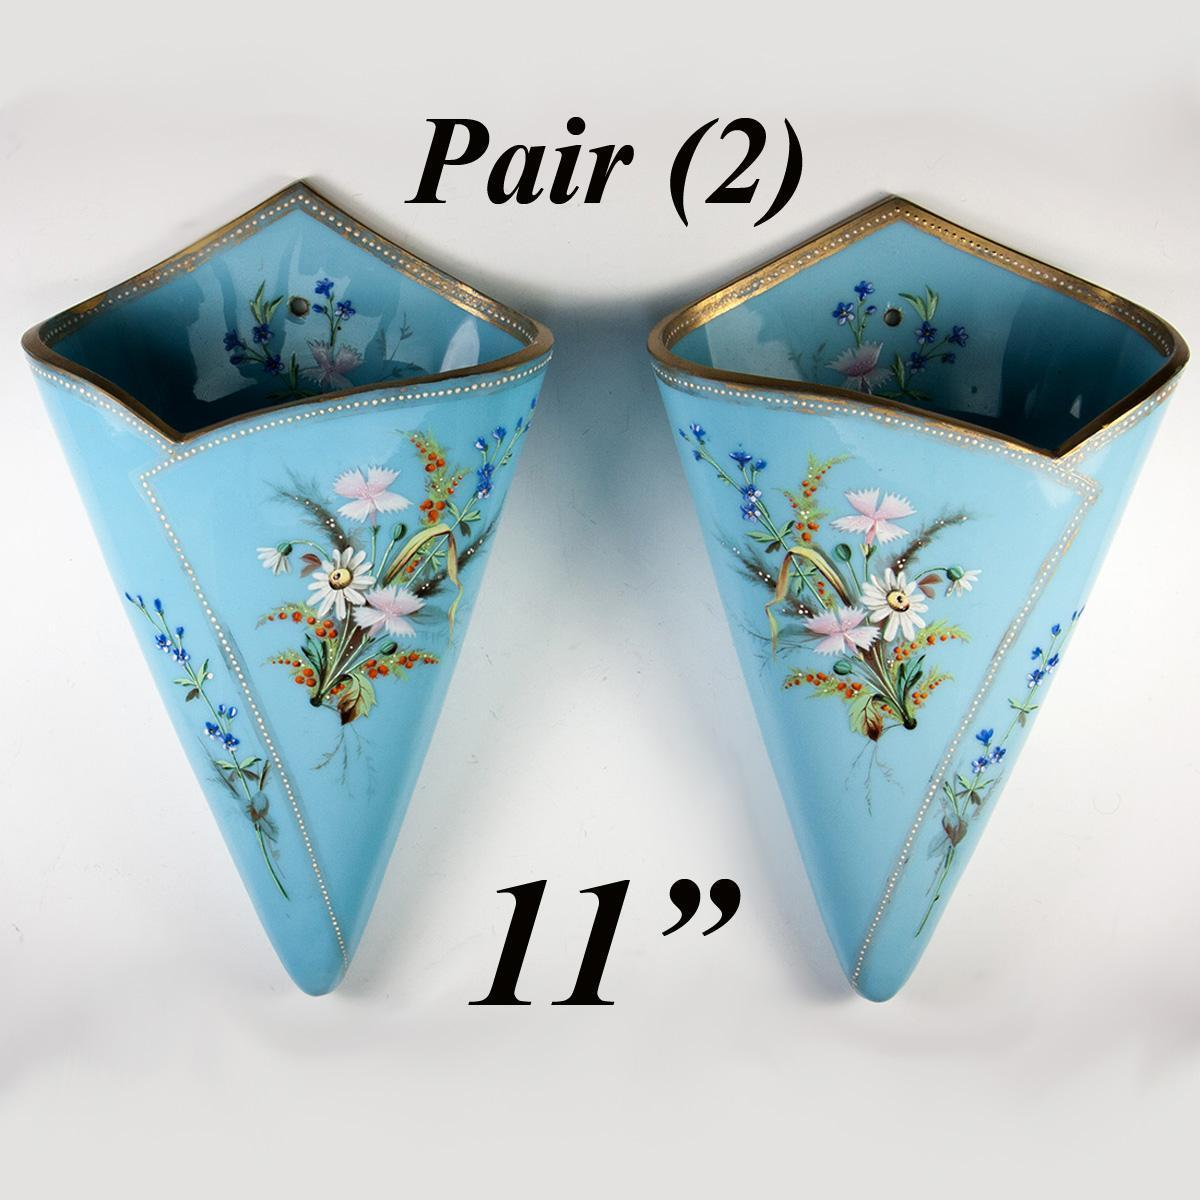 Antique Bohemian Harrach Opaline Vase PAIR, 2 Hanging Wall Pocket Vase, mid-1800, Hand Painted Enamel & Raised Jewel Dots